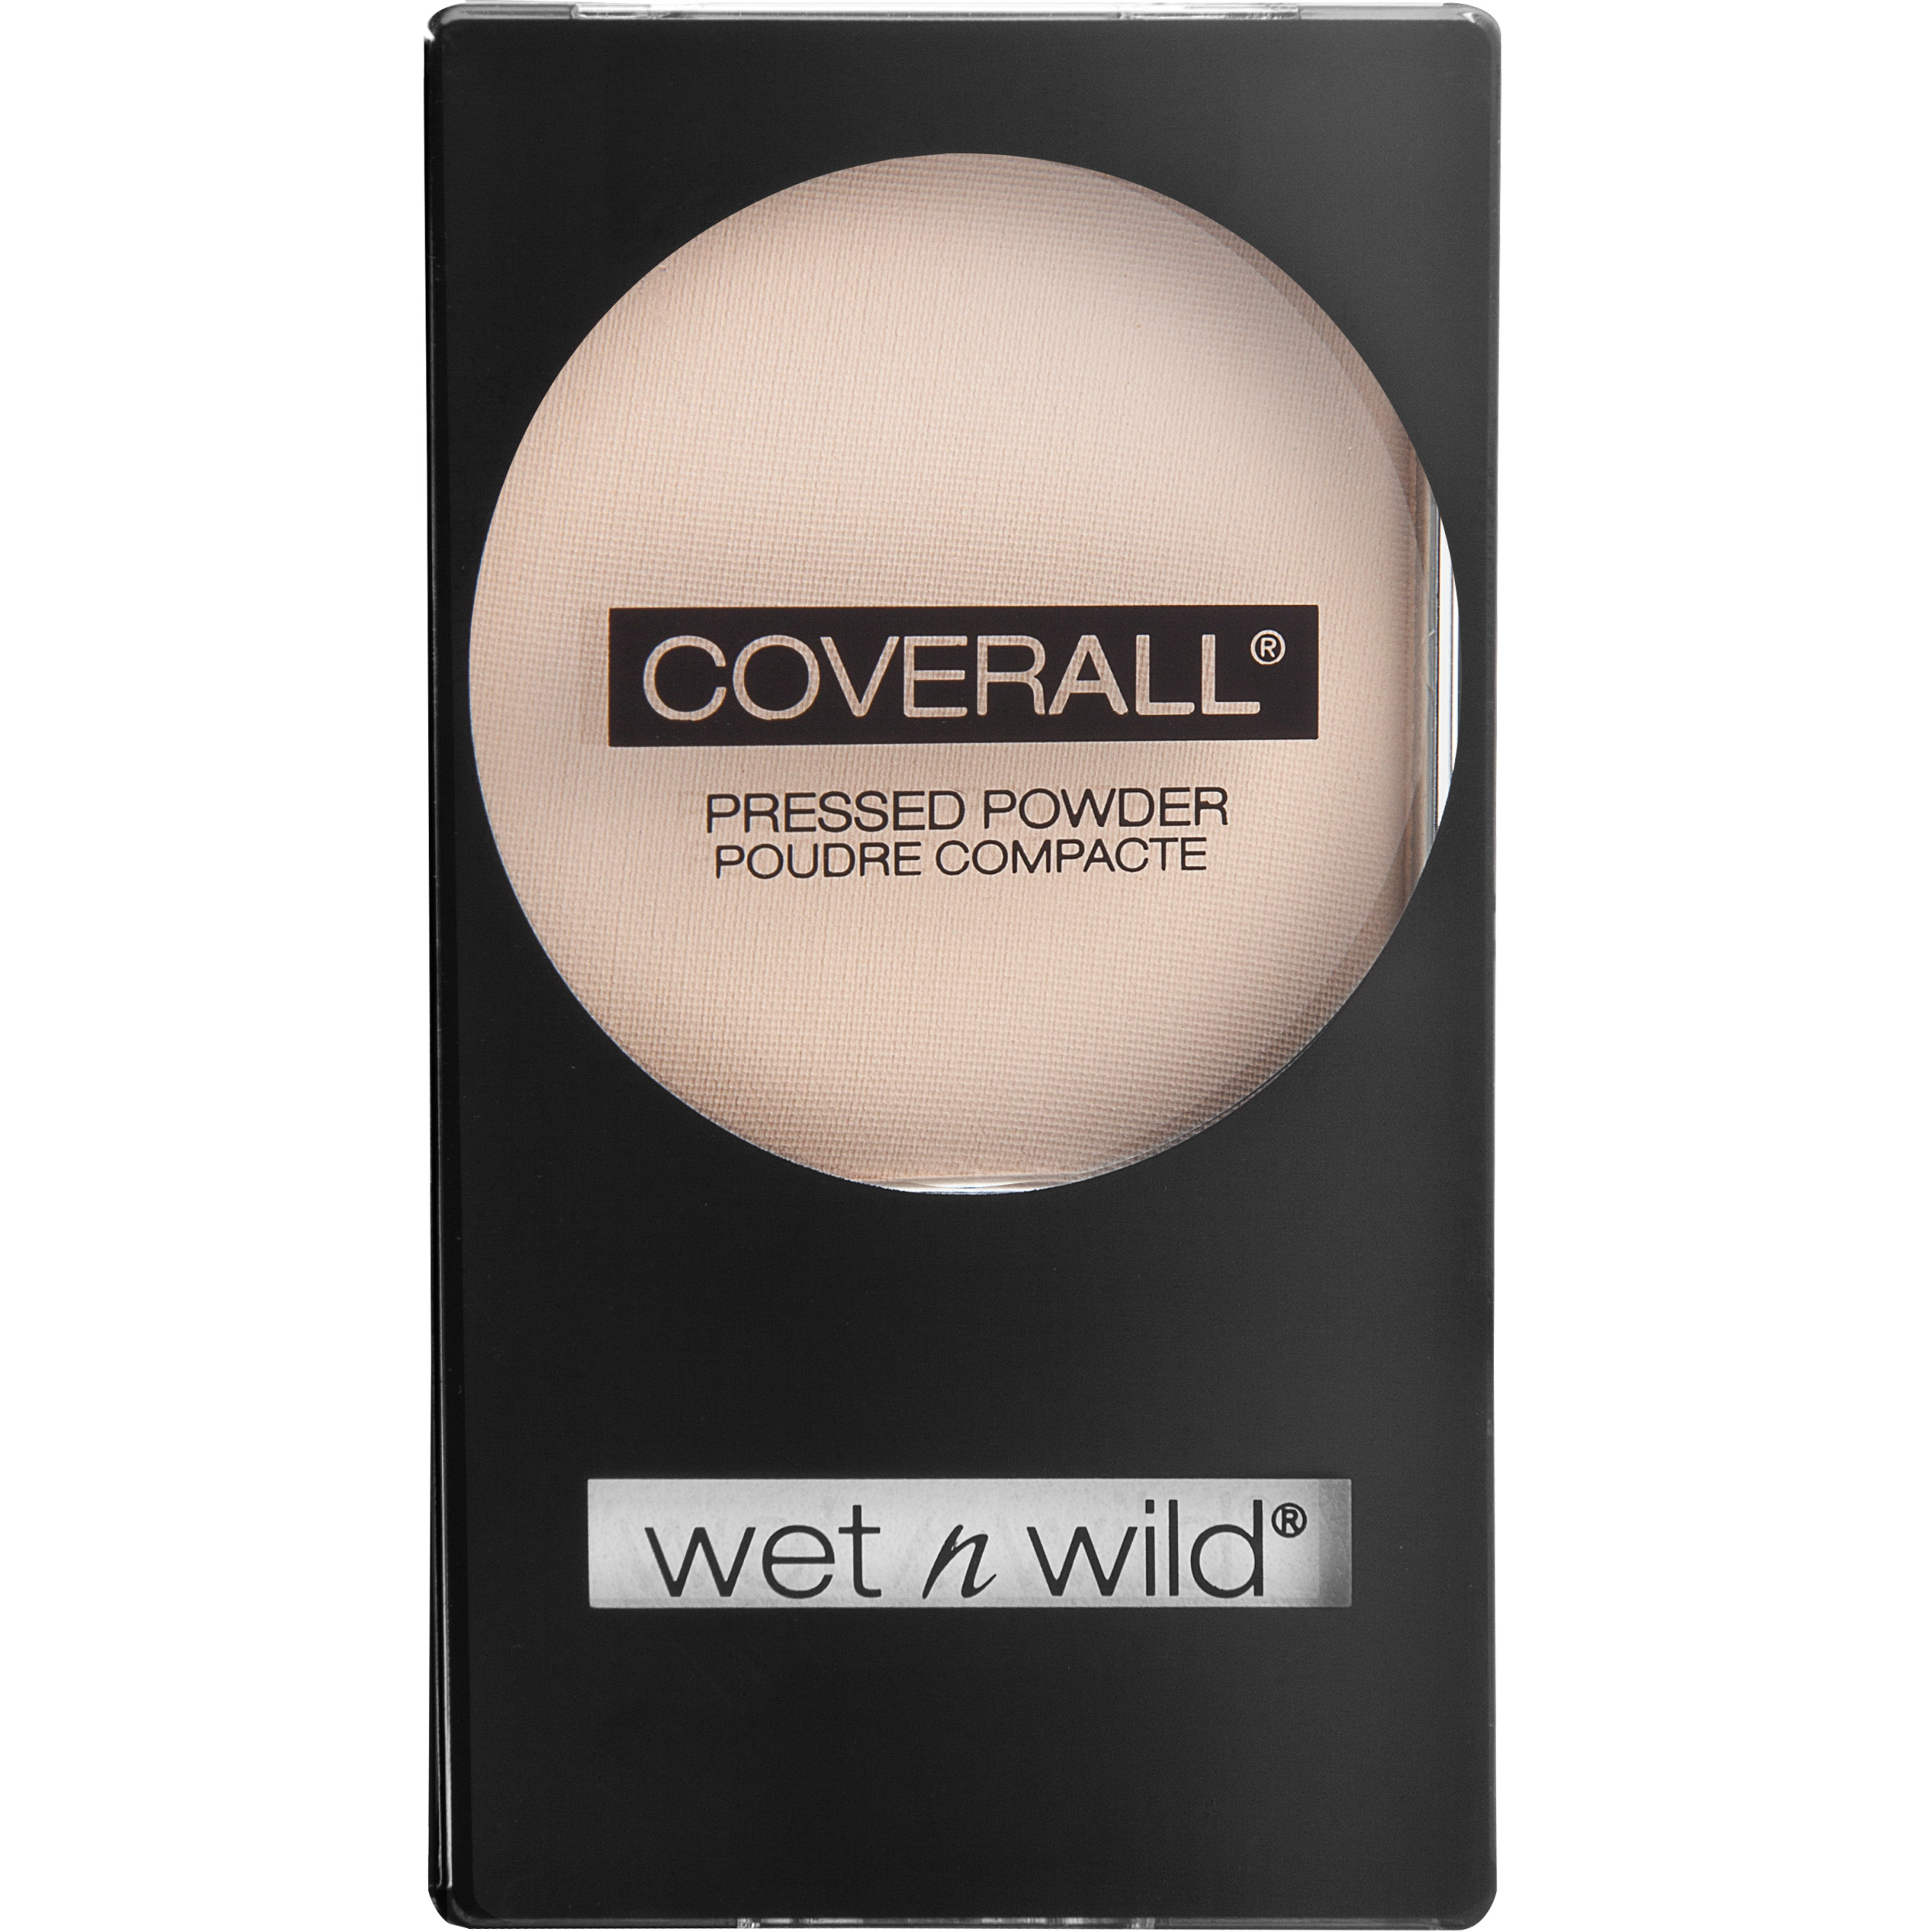 (2 Pack) wet n wild CoverAll Pressed Powder, Medium